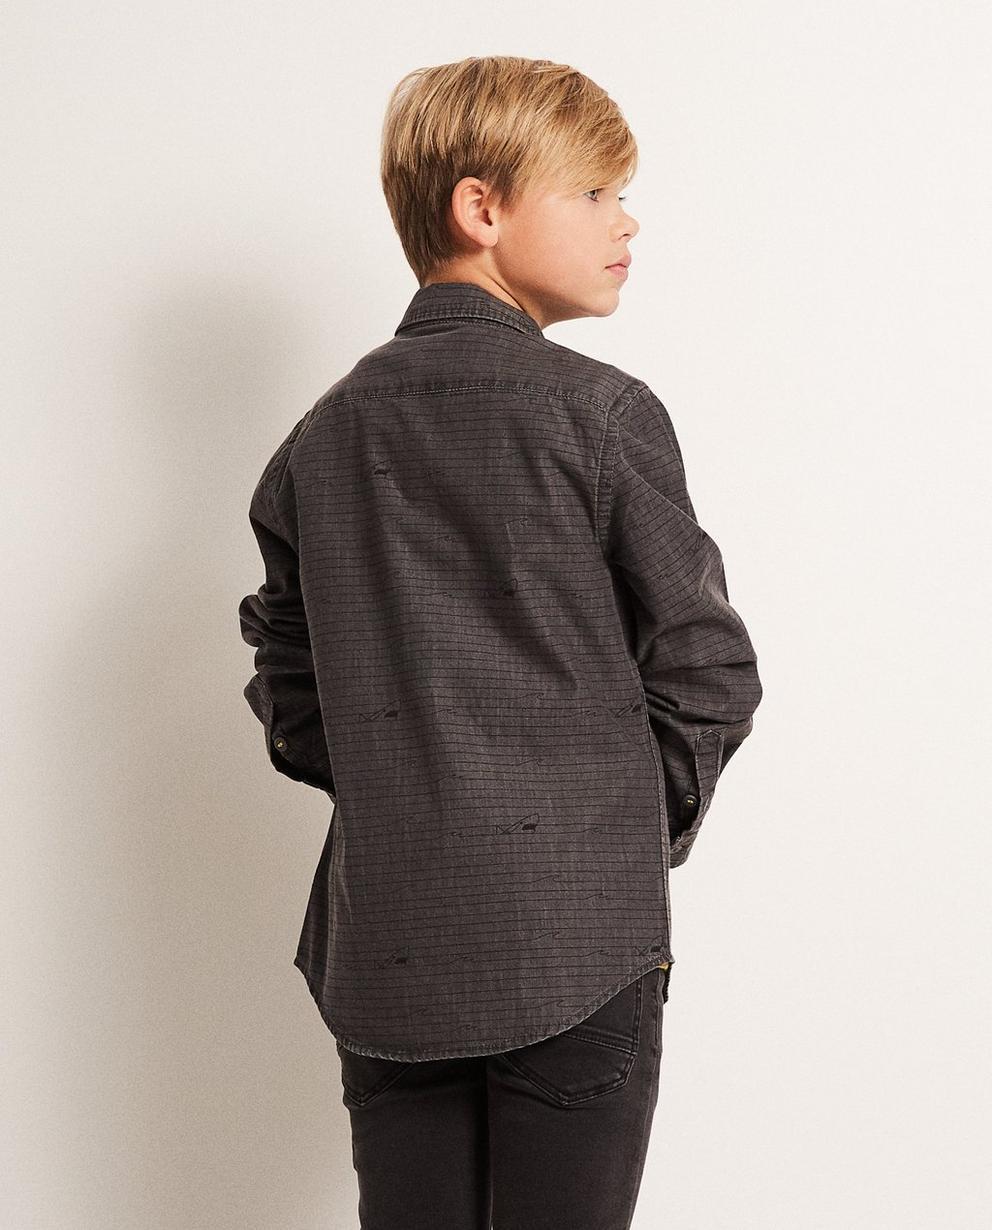 Hemden - Dunkelgrau - Jeanshemd mit Haiprint